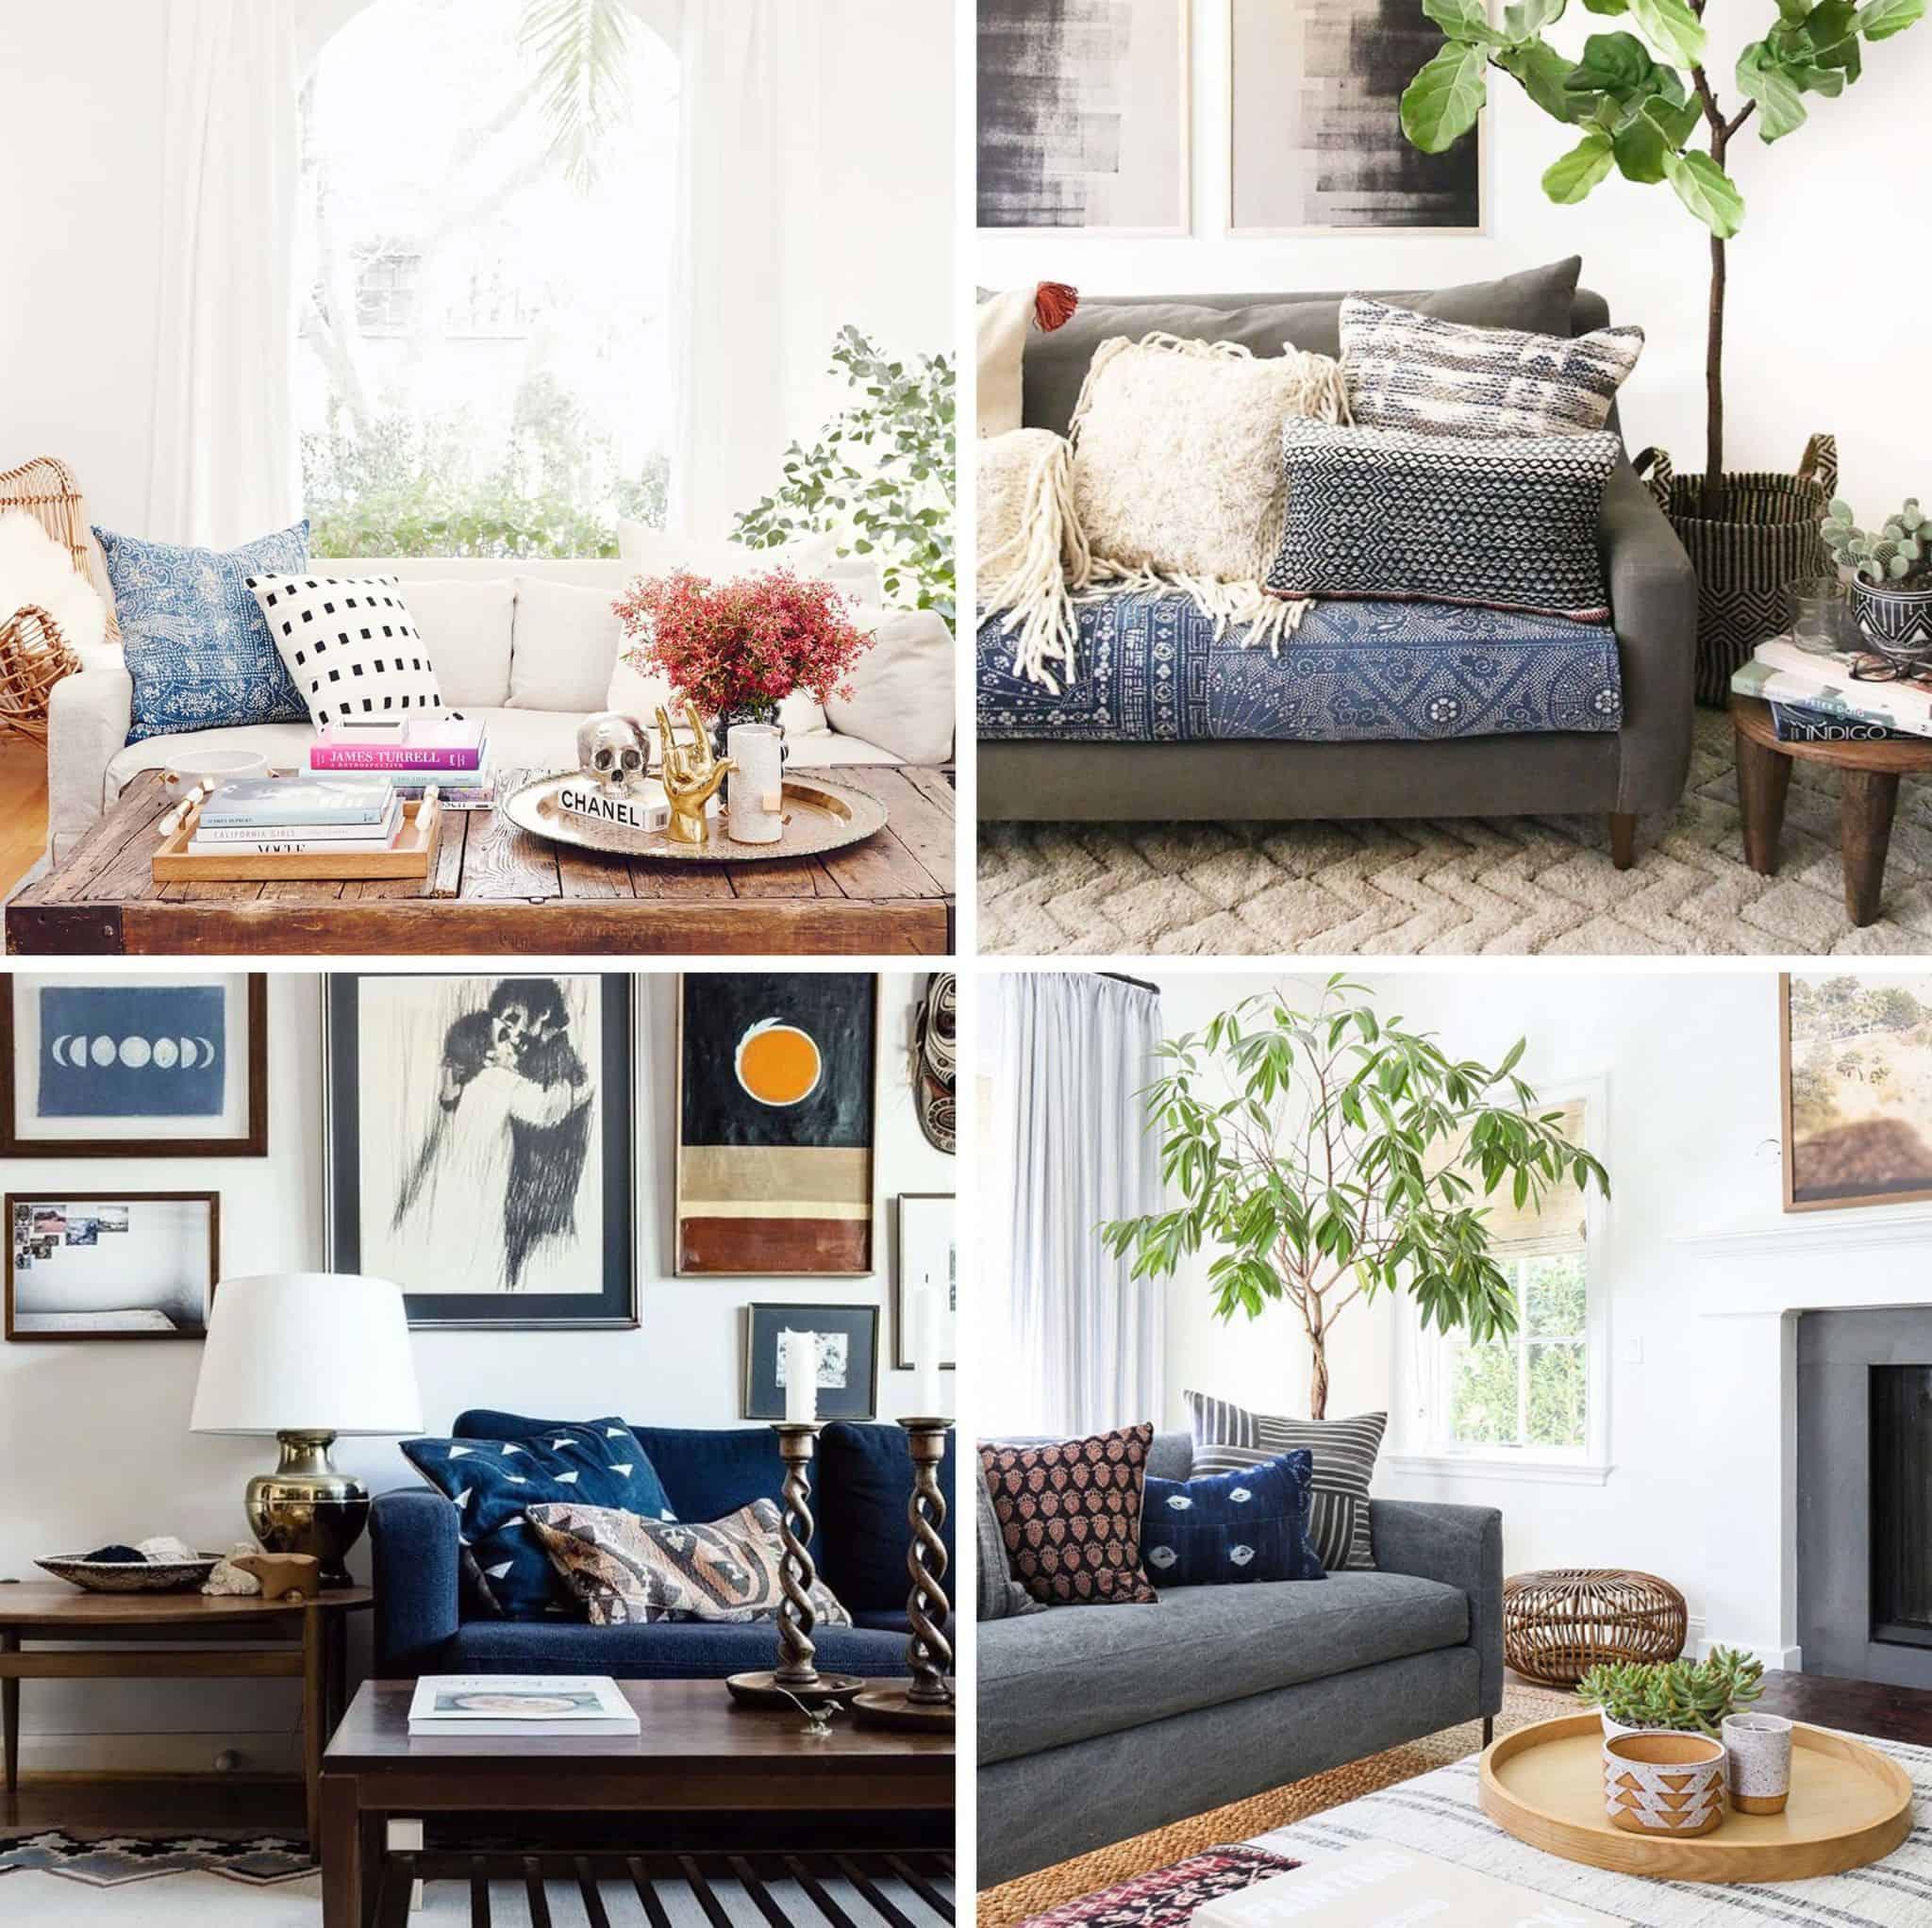 Emily Henderson_Home Office_Feminine_Modern_Airy_Bright_Blue_Pink_Inspiration_Photos